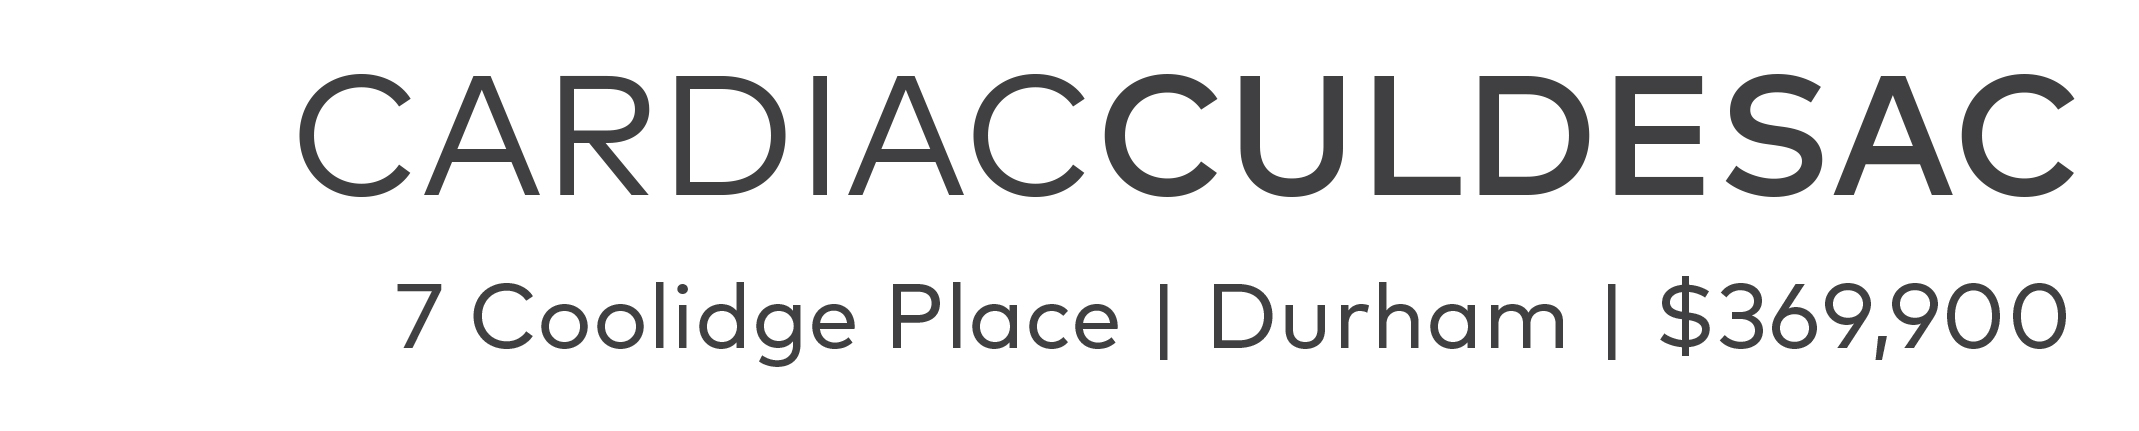 Cardiac on Cul-De-Sac, Durham NC | Listing Agent: Susan Ungerleider of RED Collective